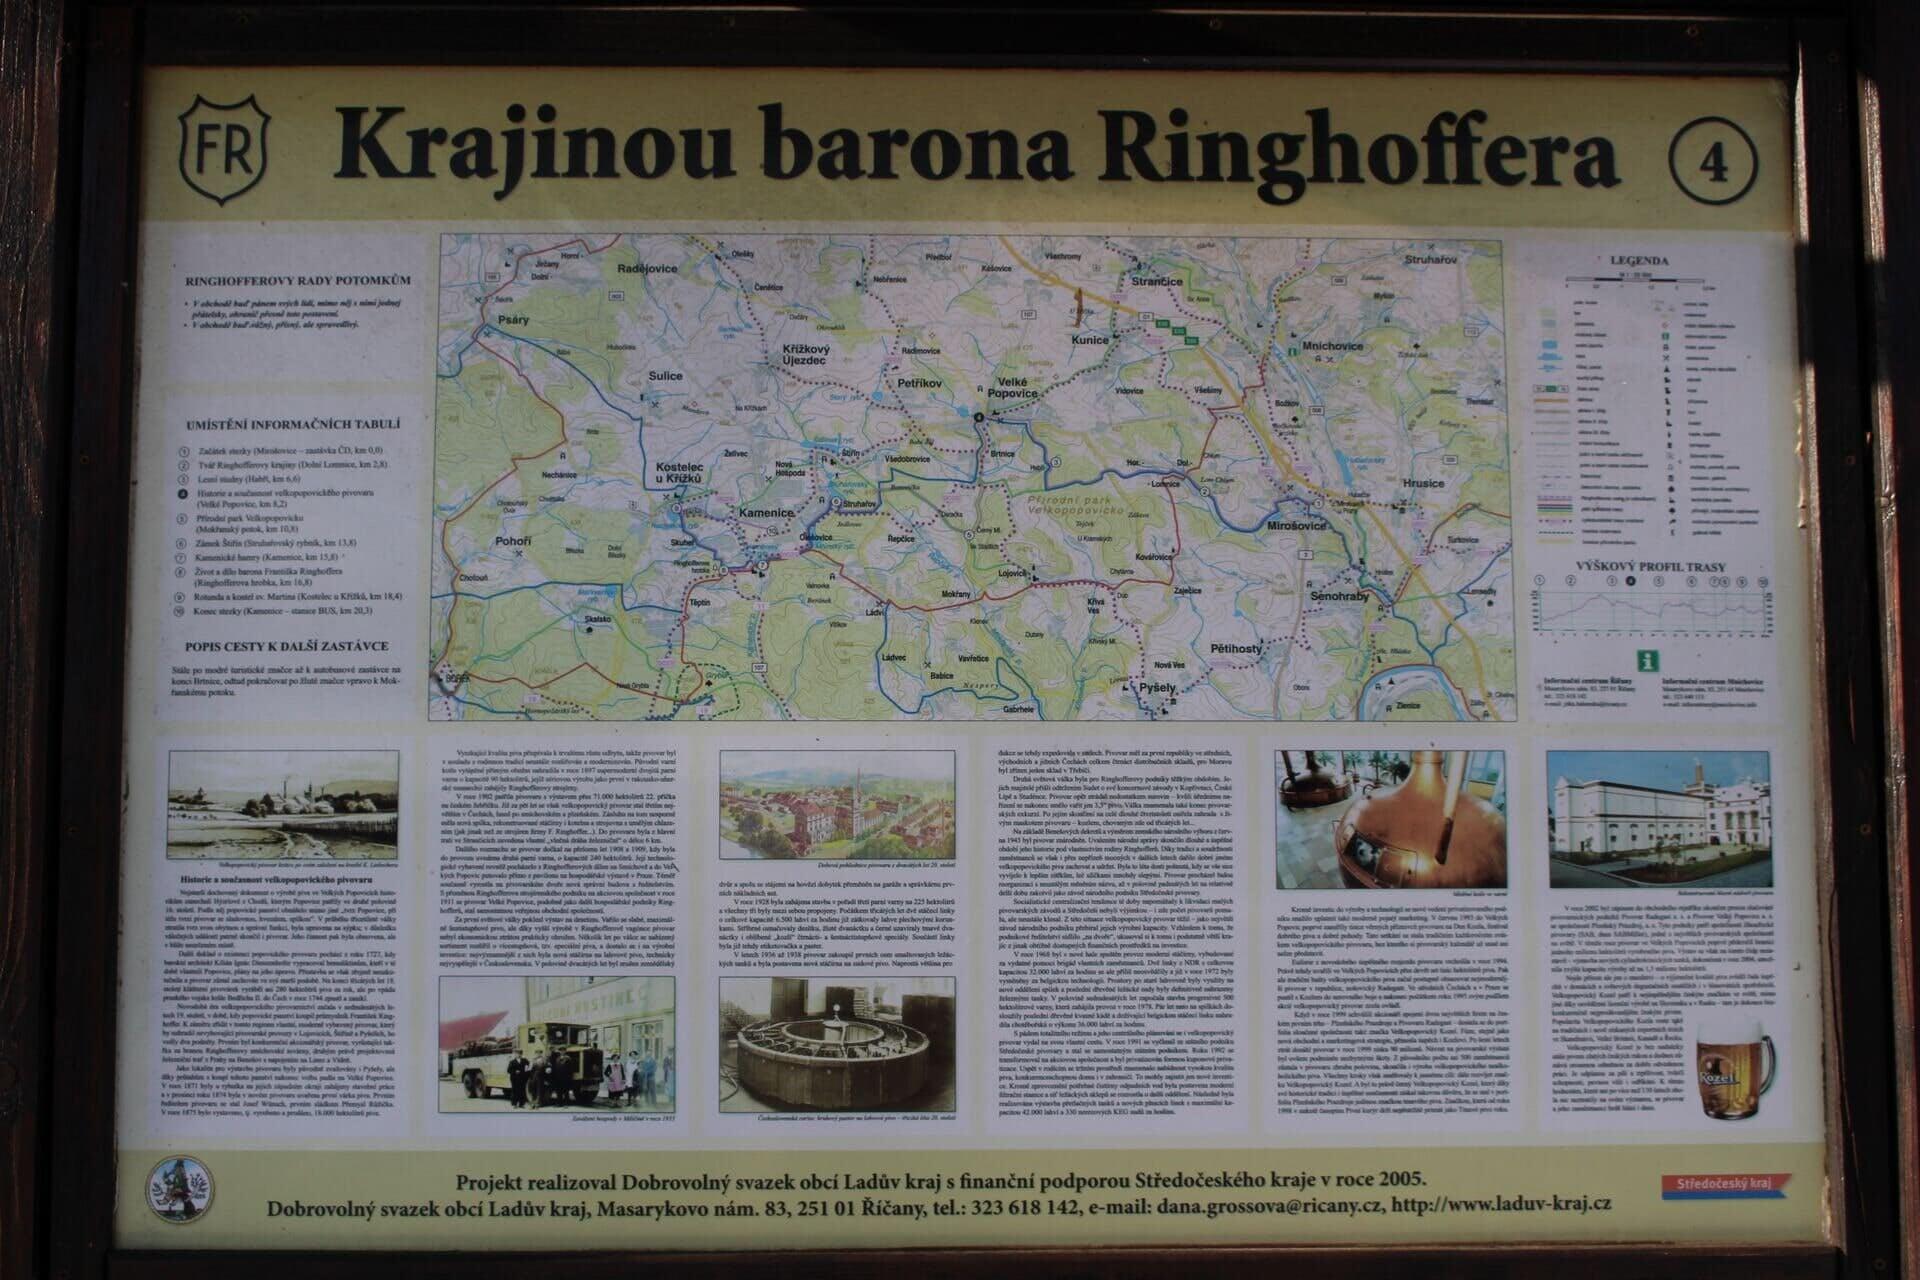 Krajinou barona Ringhoffera